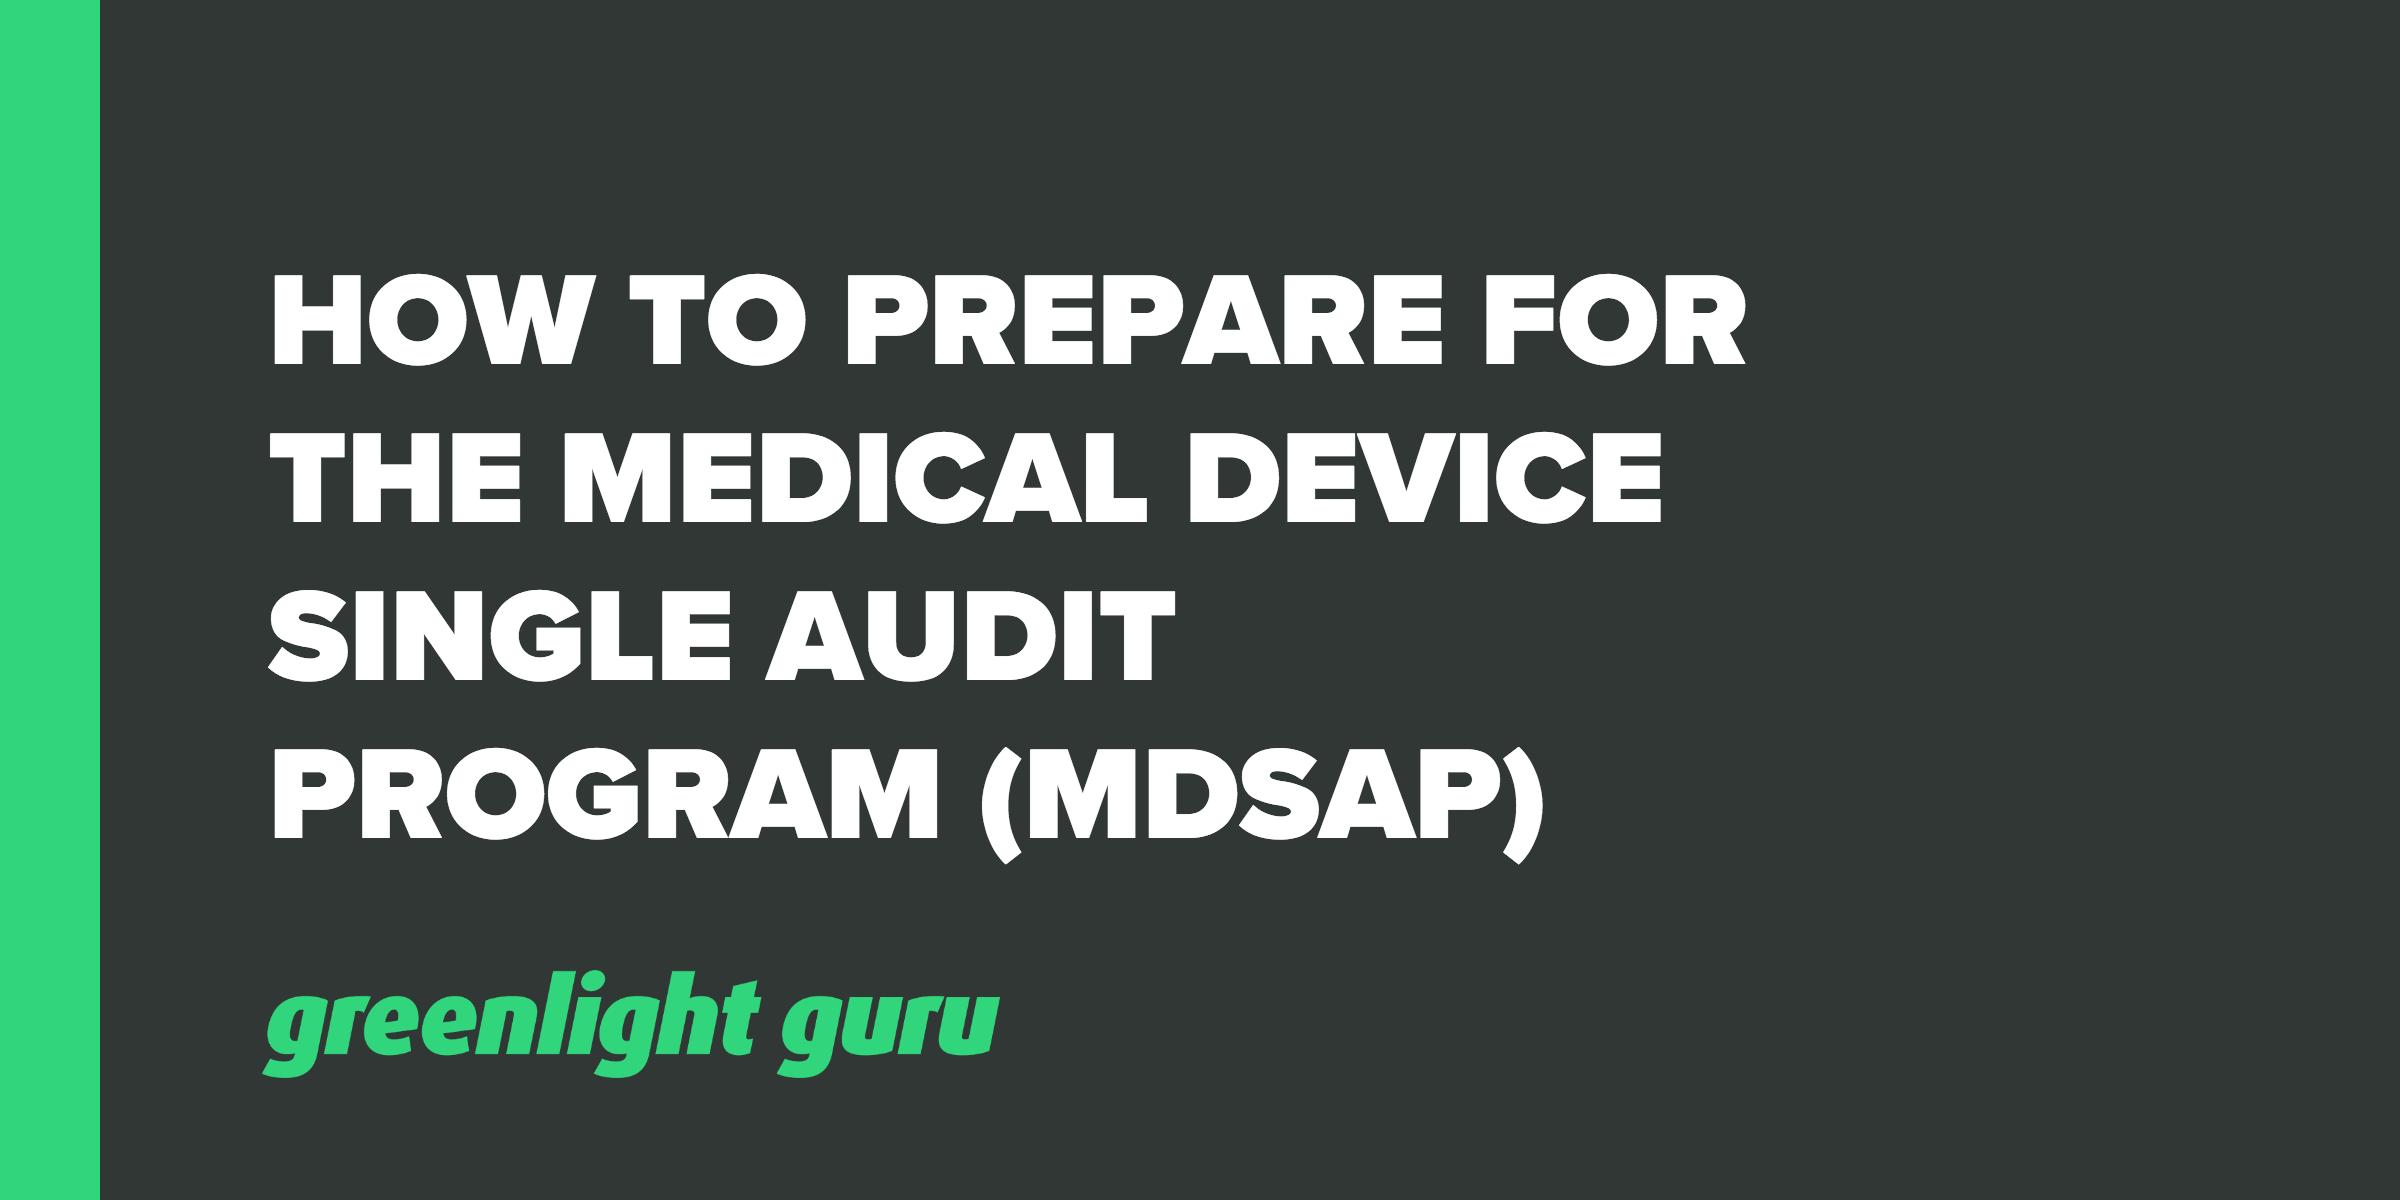 how_to_prepare_mdsap